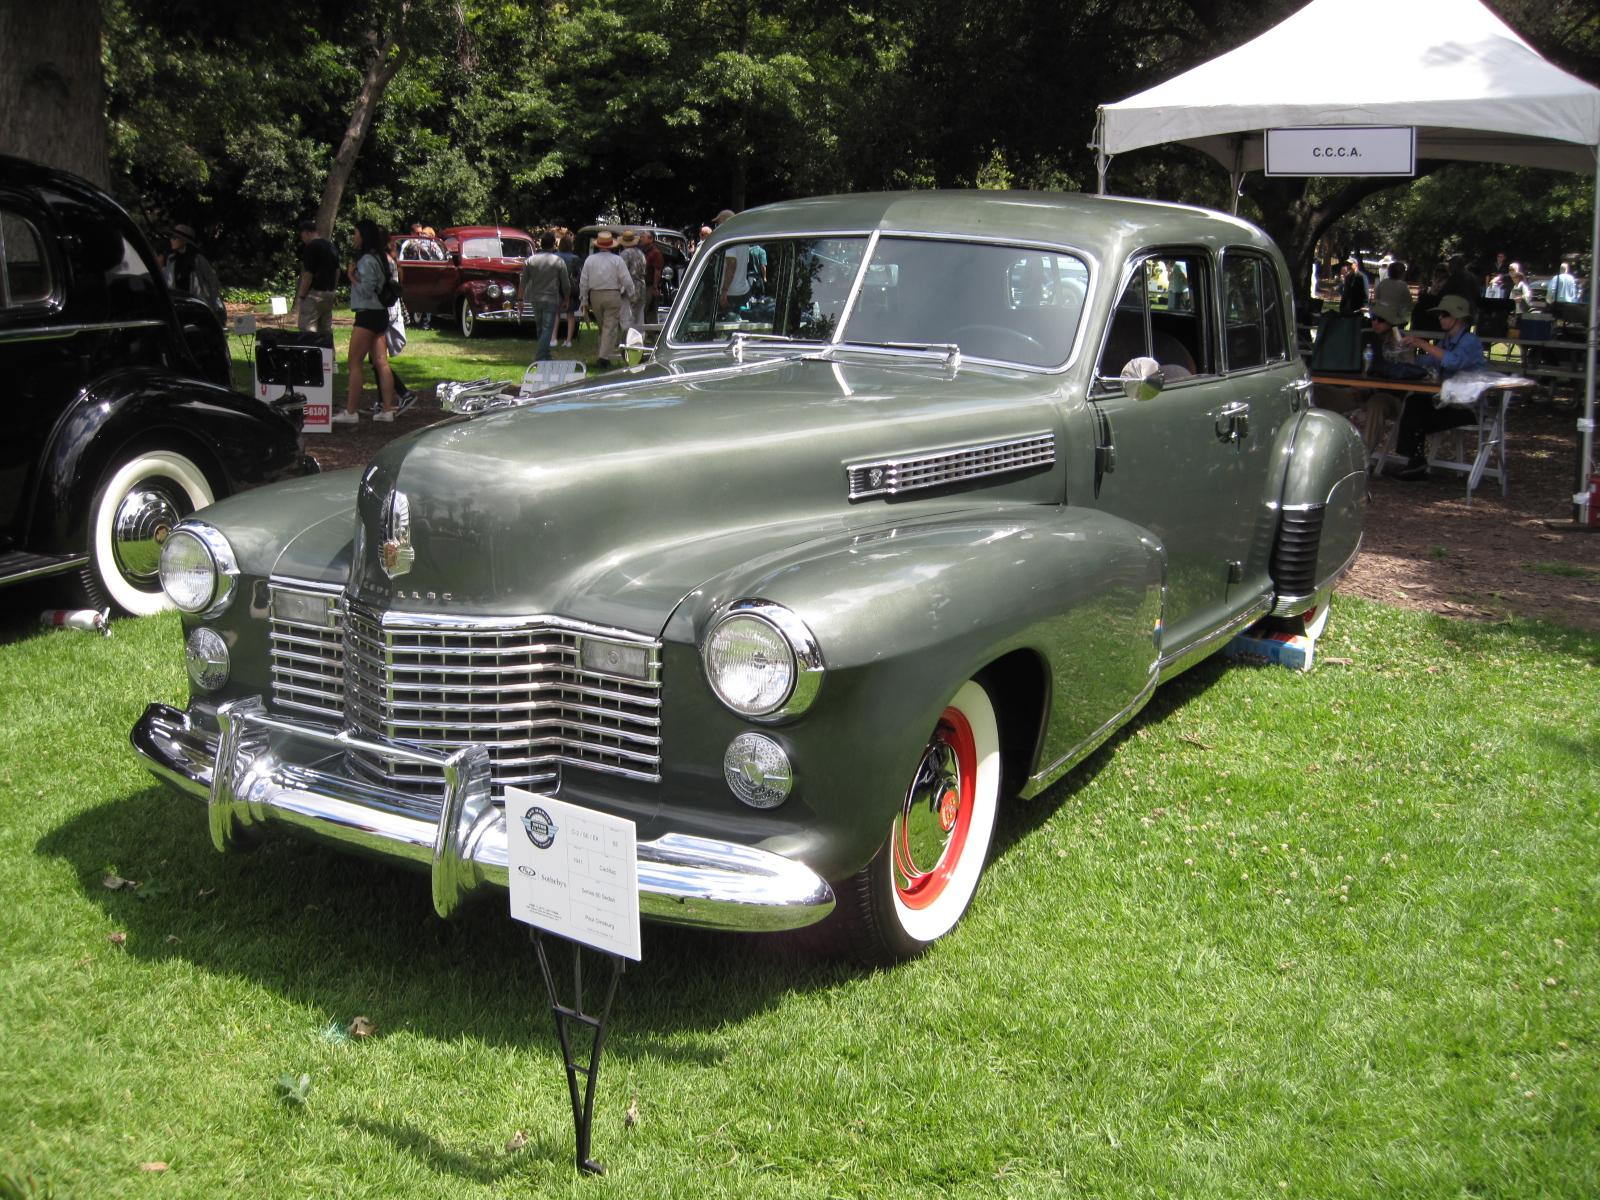 1941 Cadillac 60 Special Paul Ginsburg.JPG